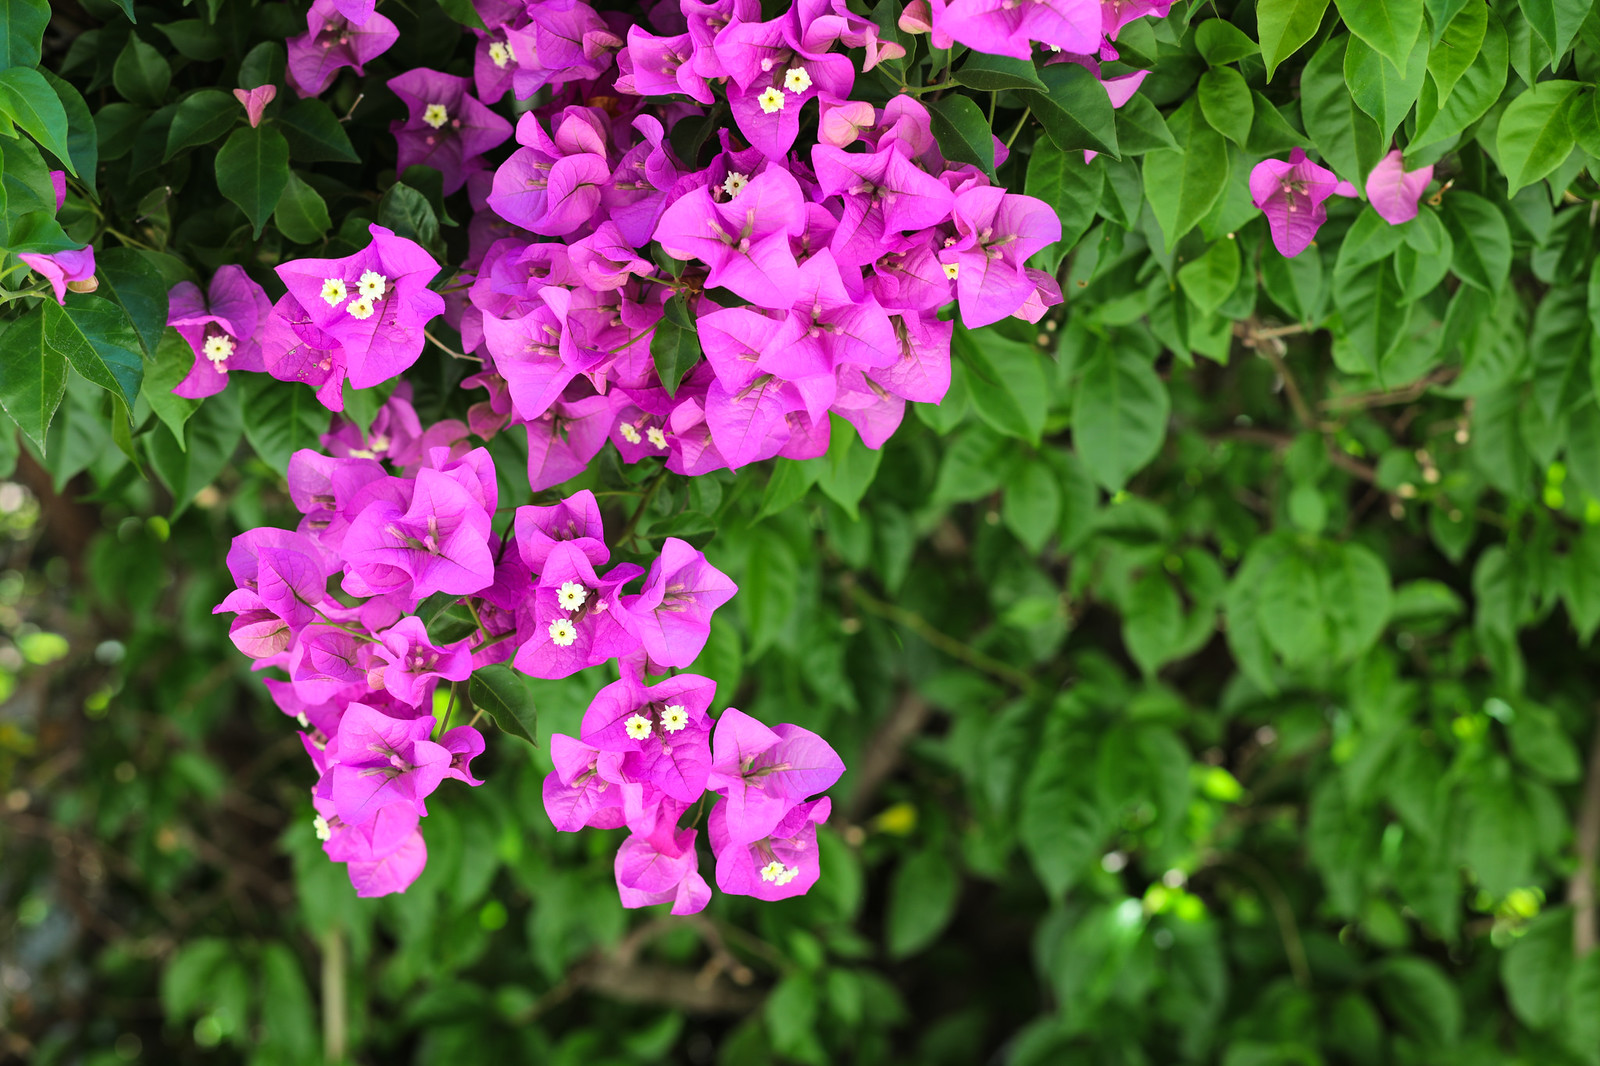 Exterior 725 University Blu Skye Media-8678-X3.jpg